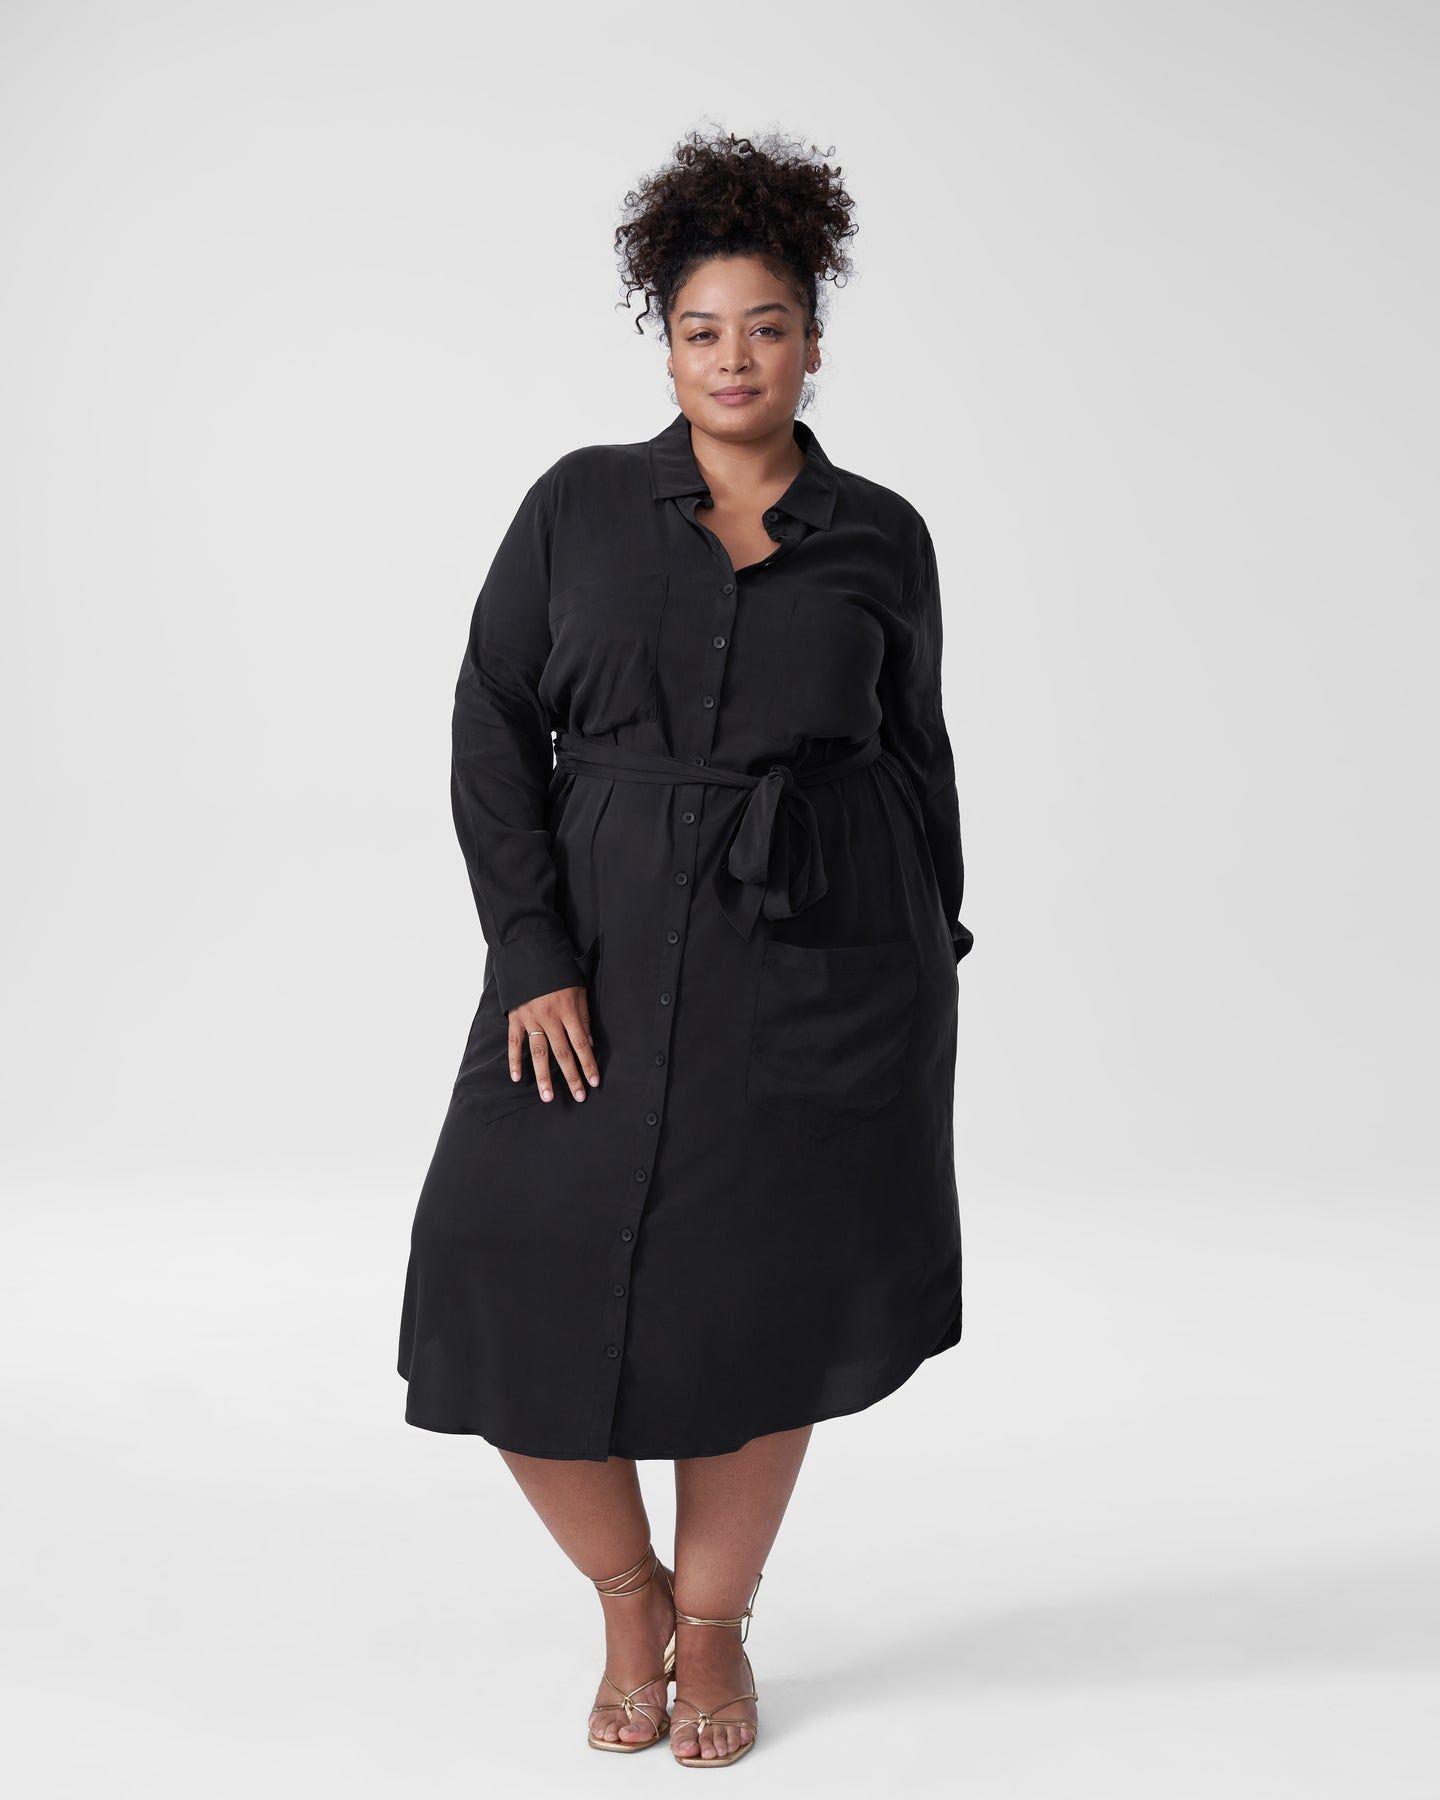 Michelle Cupro Shirt Dress - Black - image 0